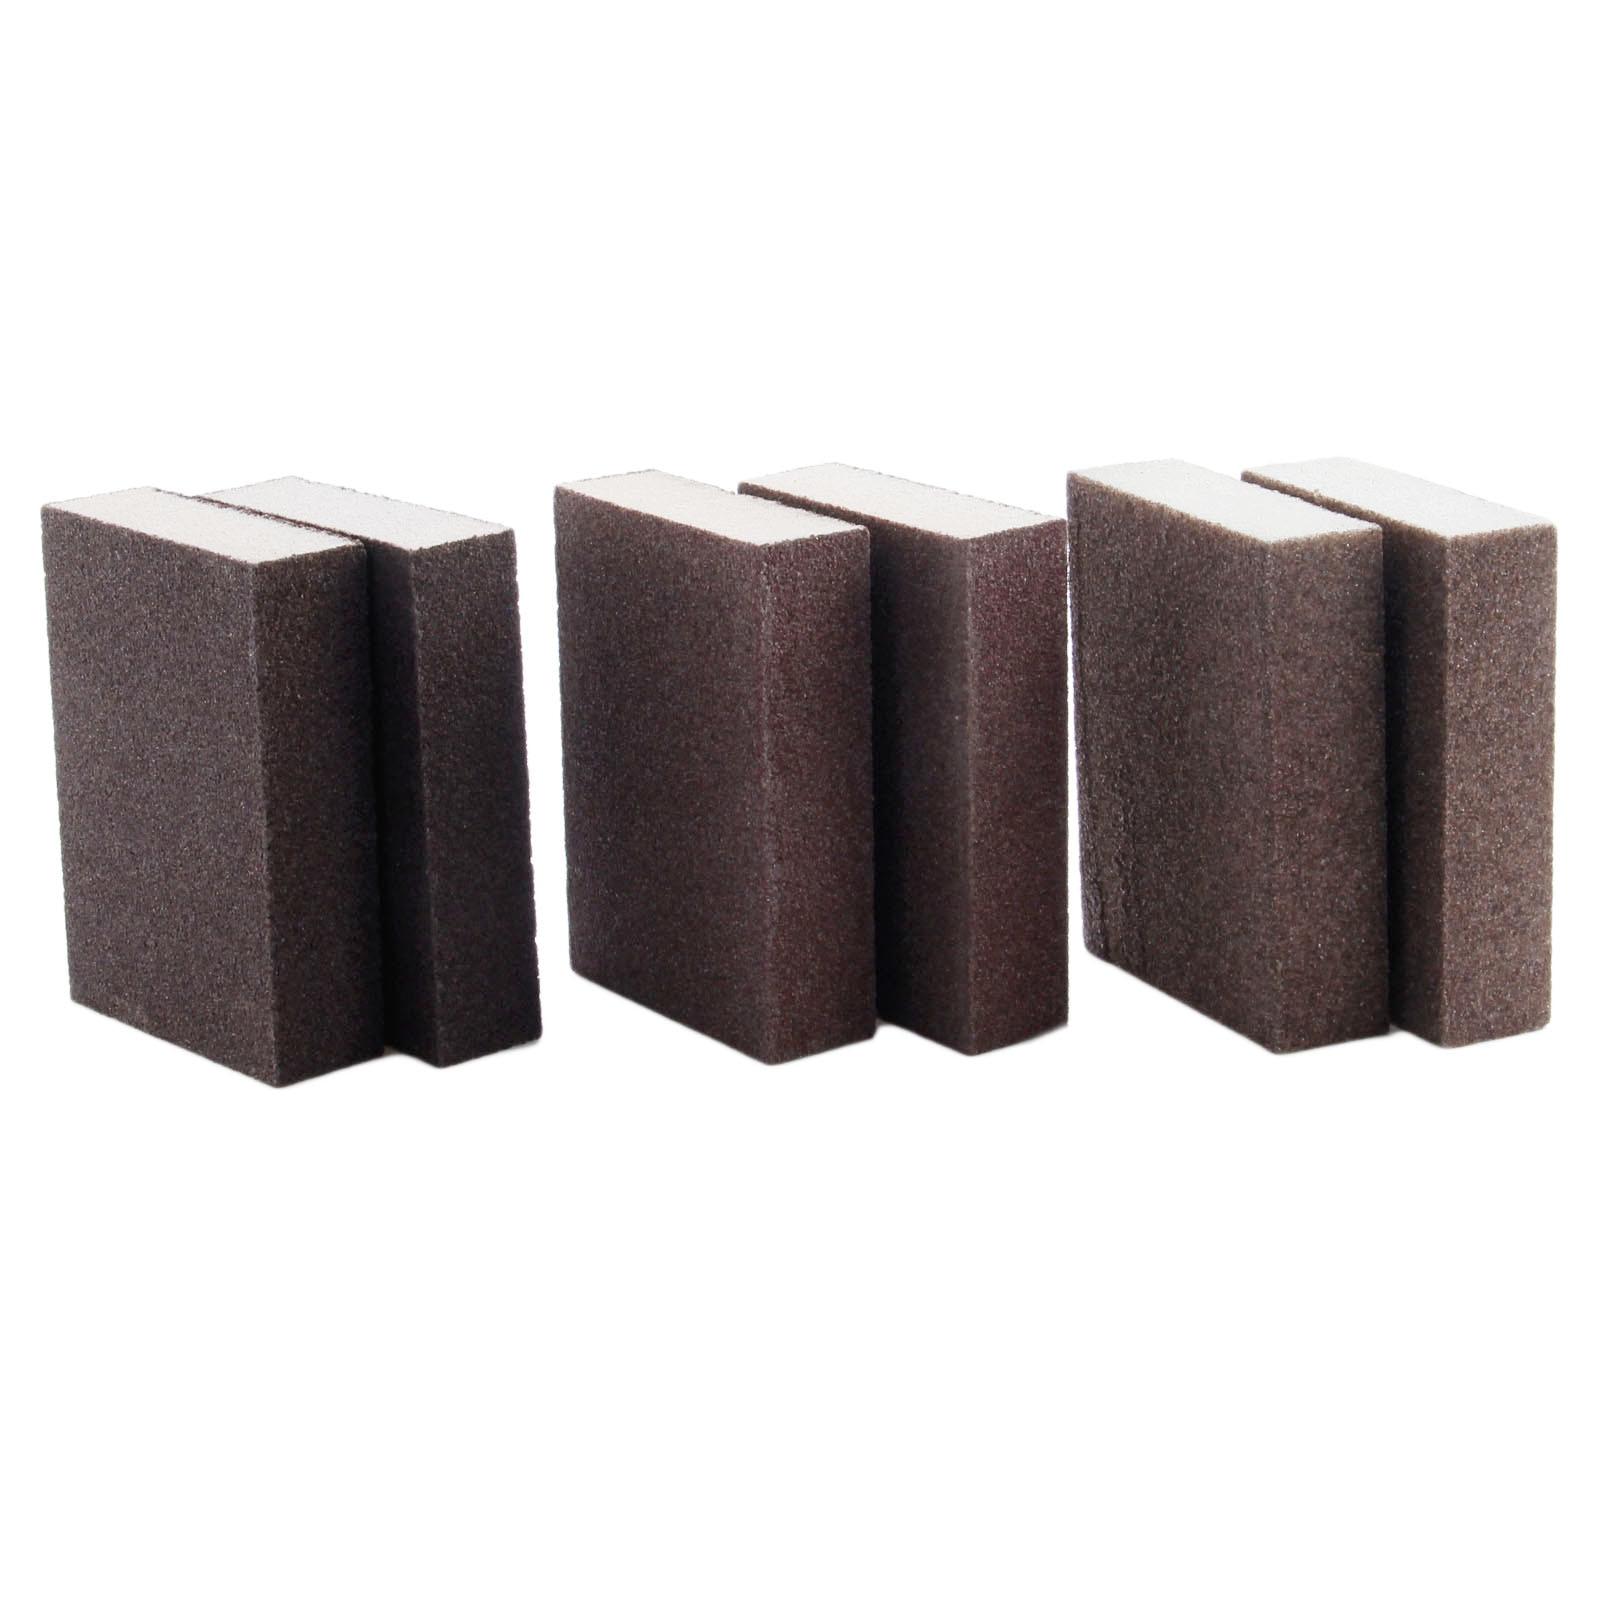 DRELD 2Pcs Abrasive Foam Polishing Sanding Sponge Block Sandpaper Assorted Grit 60 80 120 Grinding Buffing Pad Polishing Tools